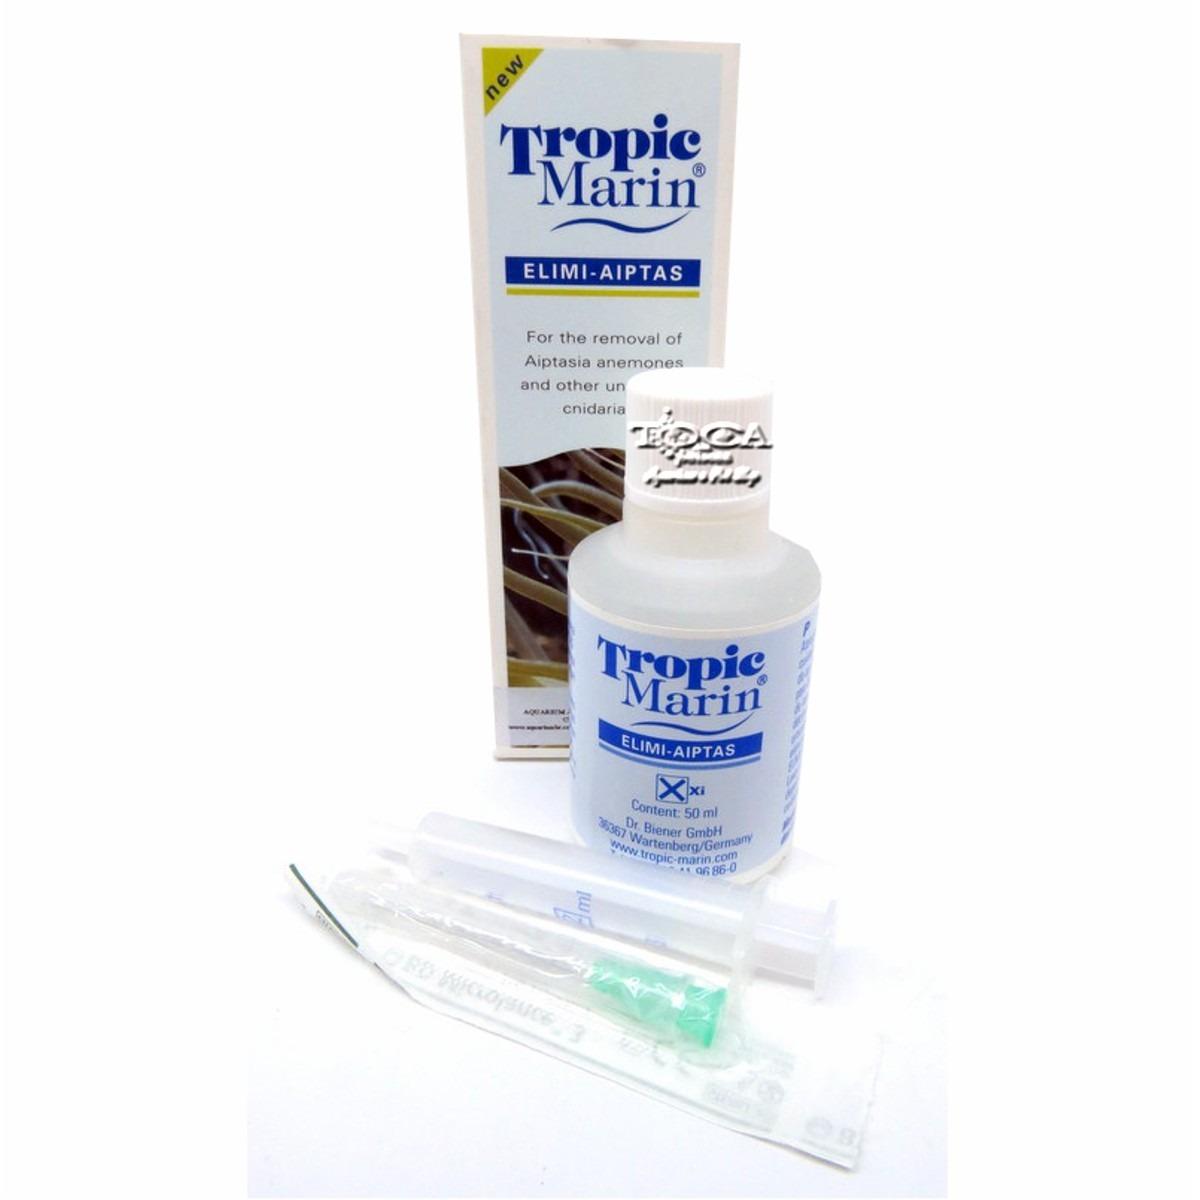 Tropic Marin Elimi Aiptas 50ml - Eliminador De Aiptasias